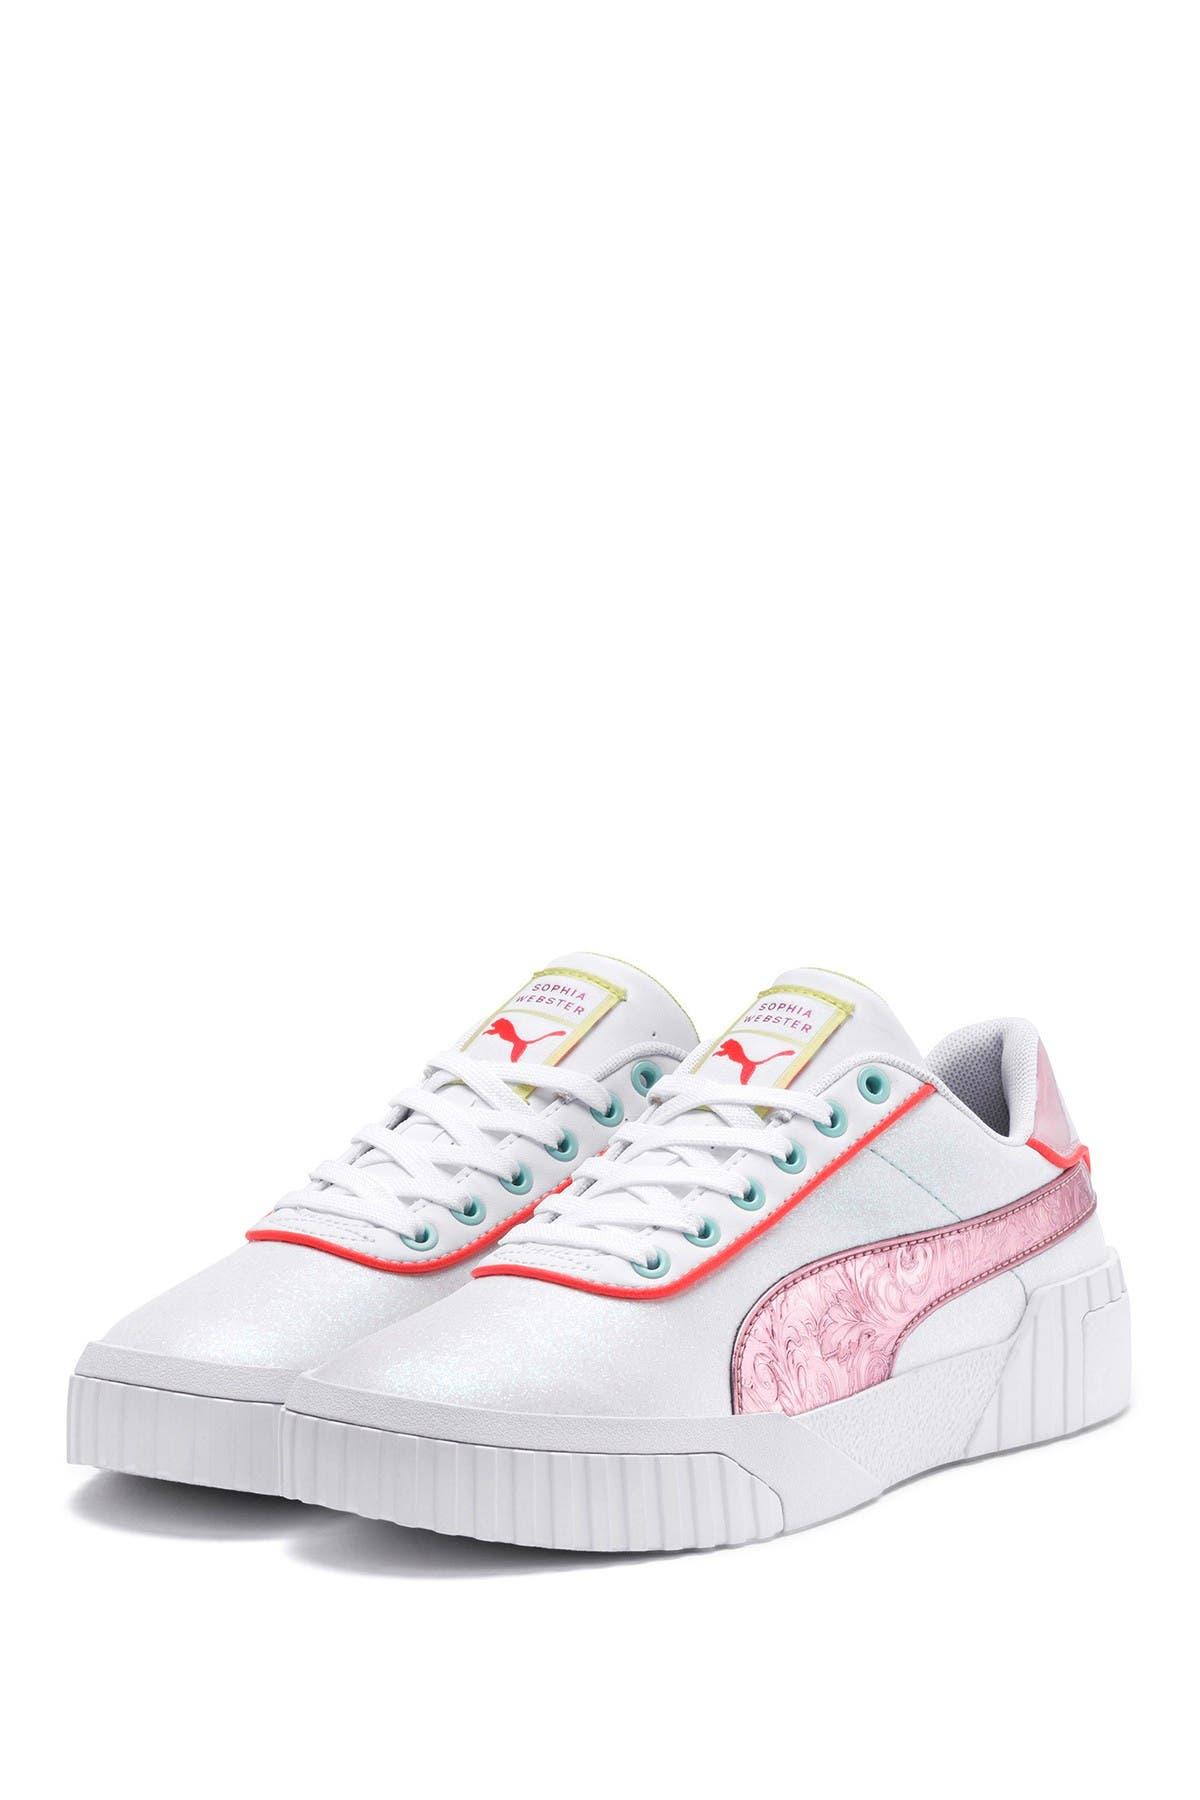 Image of PUMA Cali Sophia Webster Sneaker